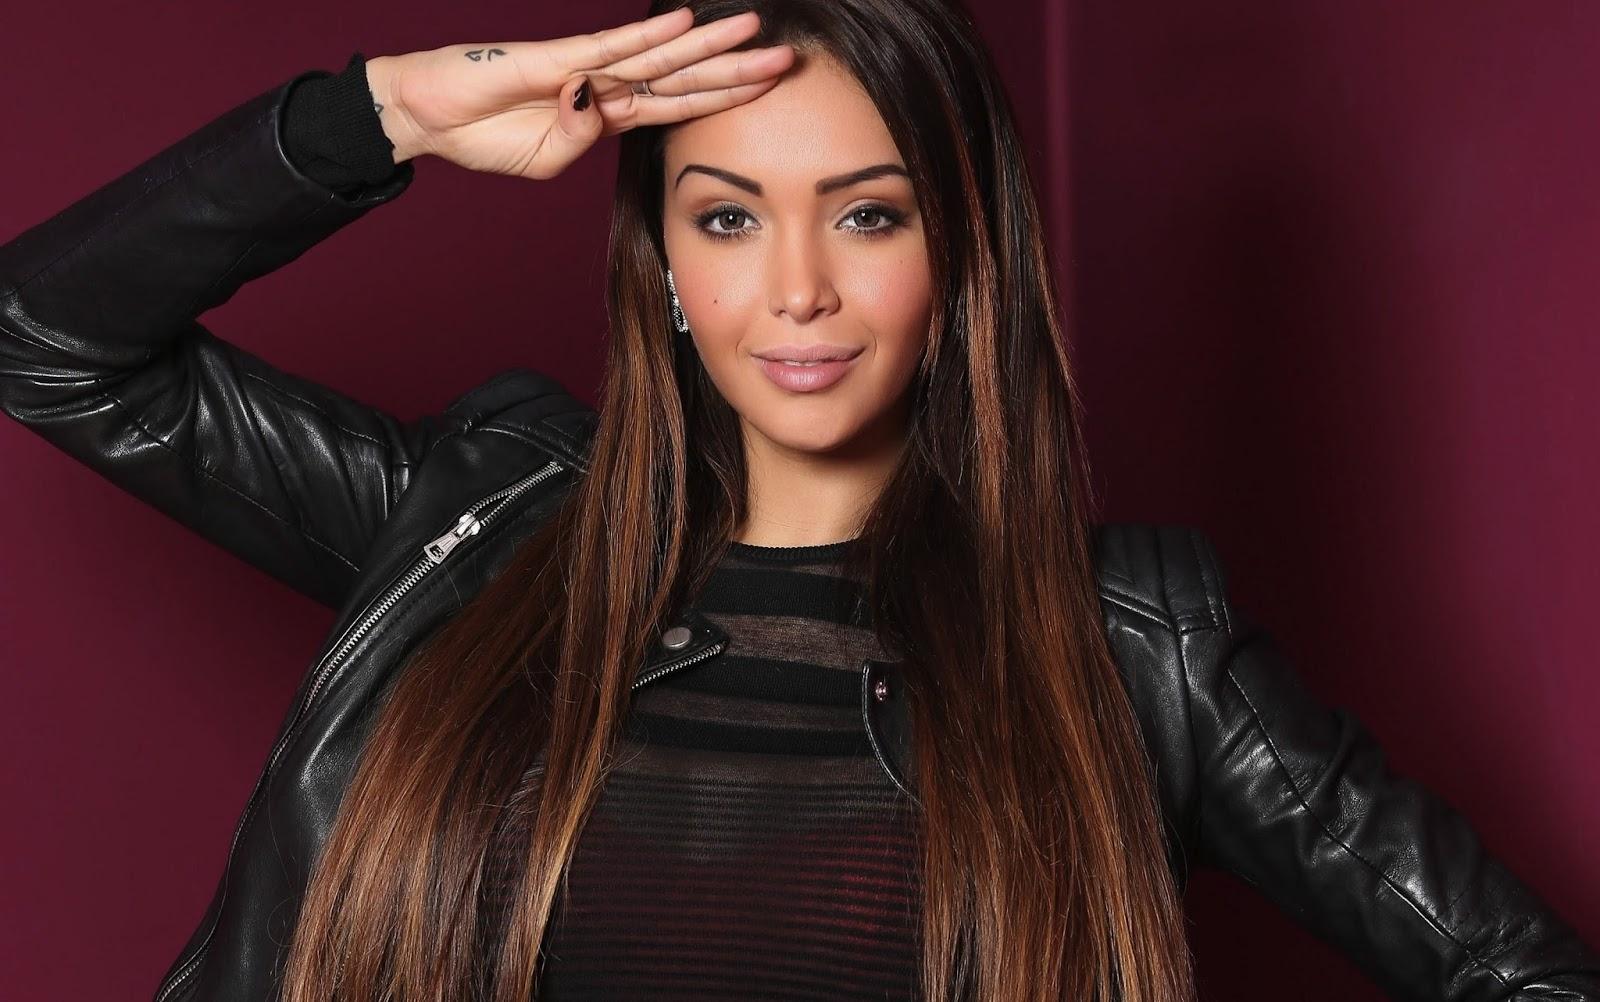 French tv actress nabilla benattia full hd images for 1st international salon of photography kula 2013